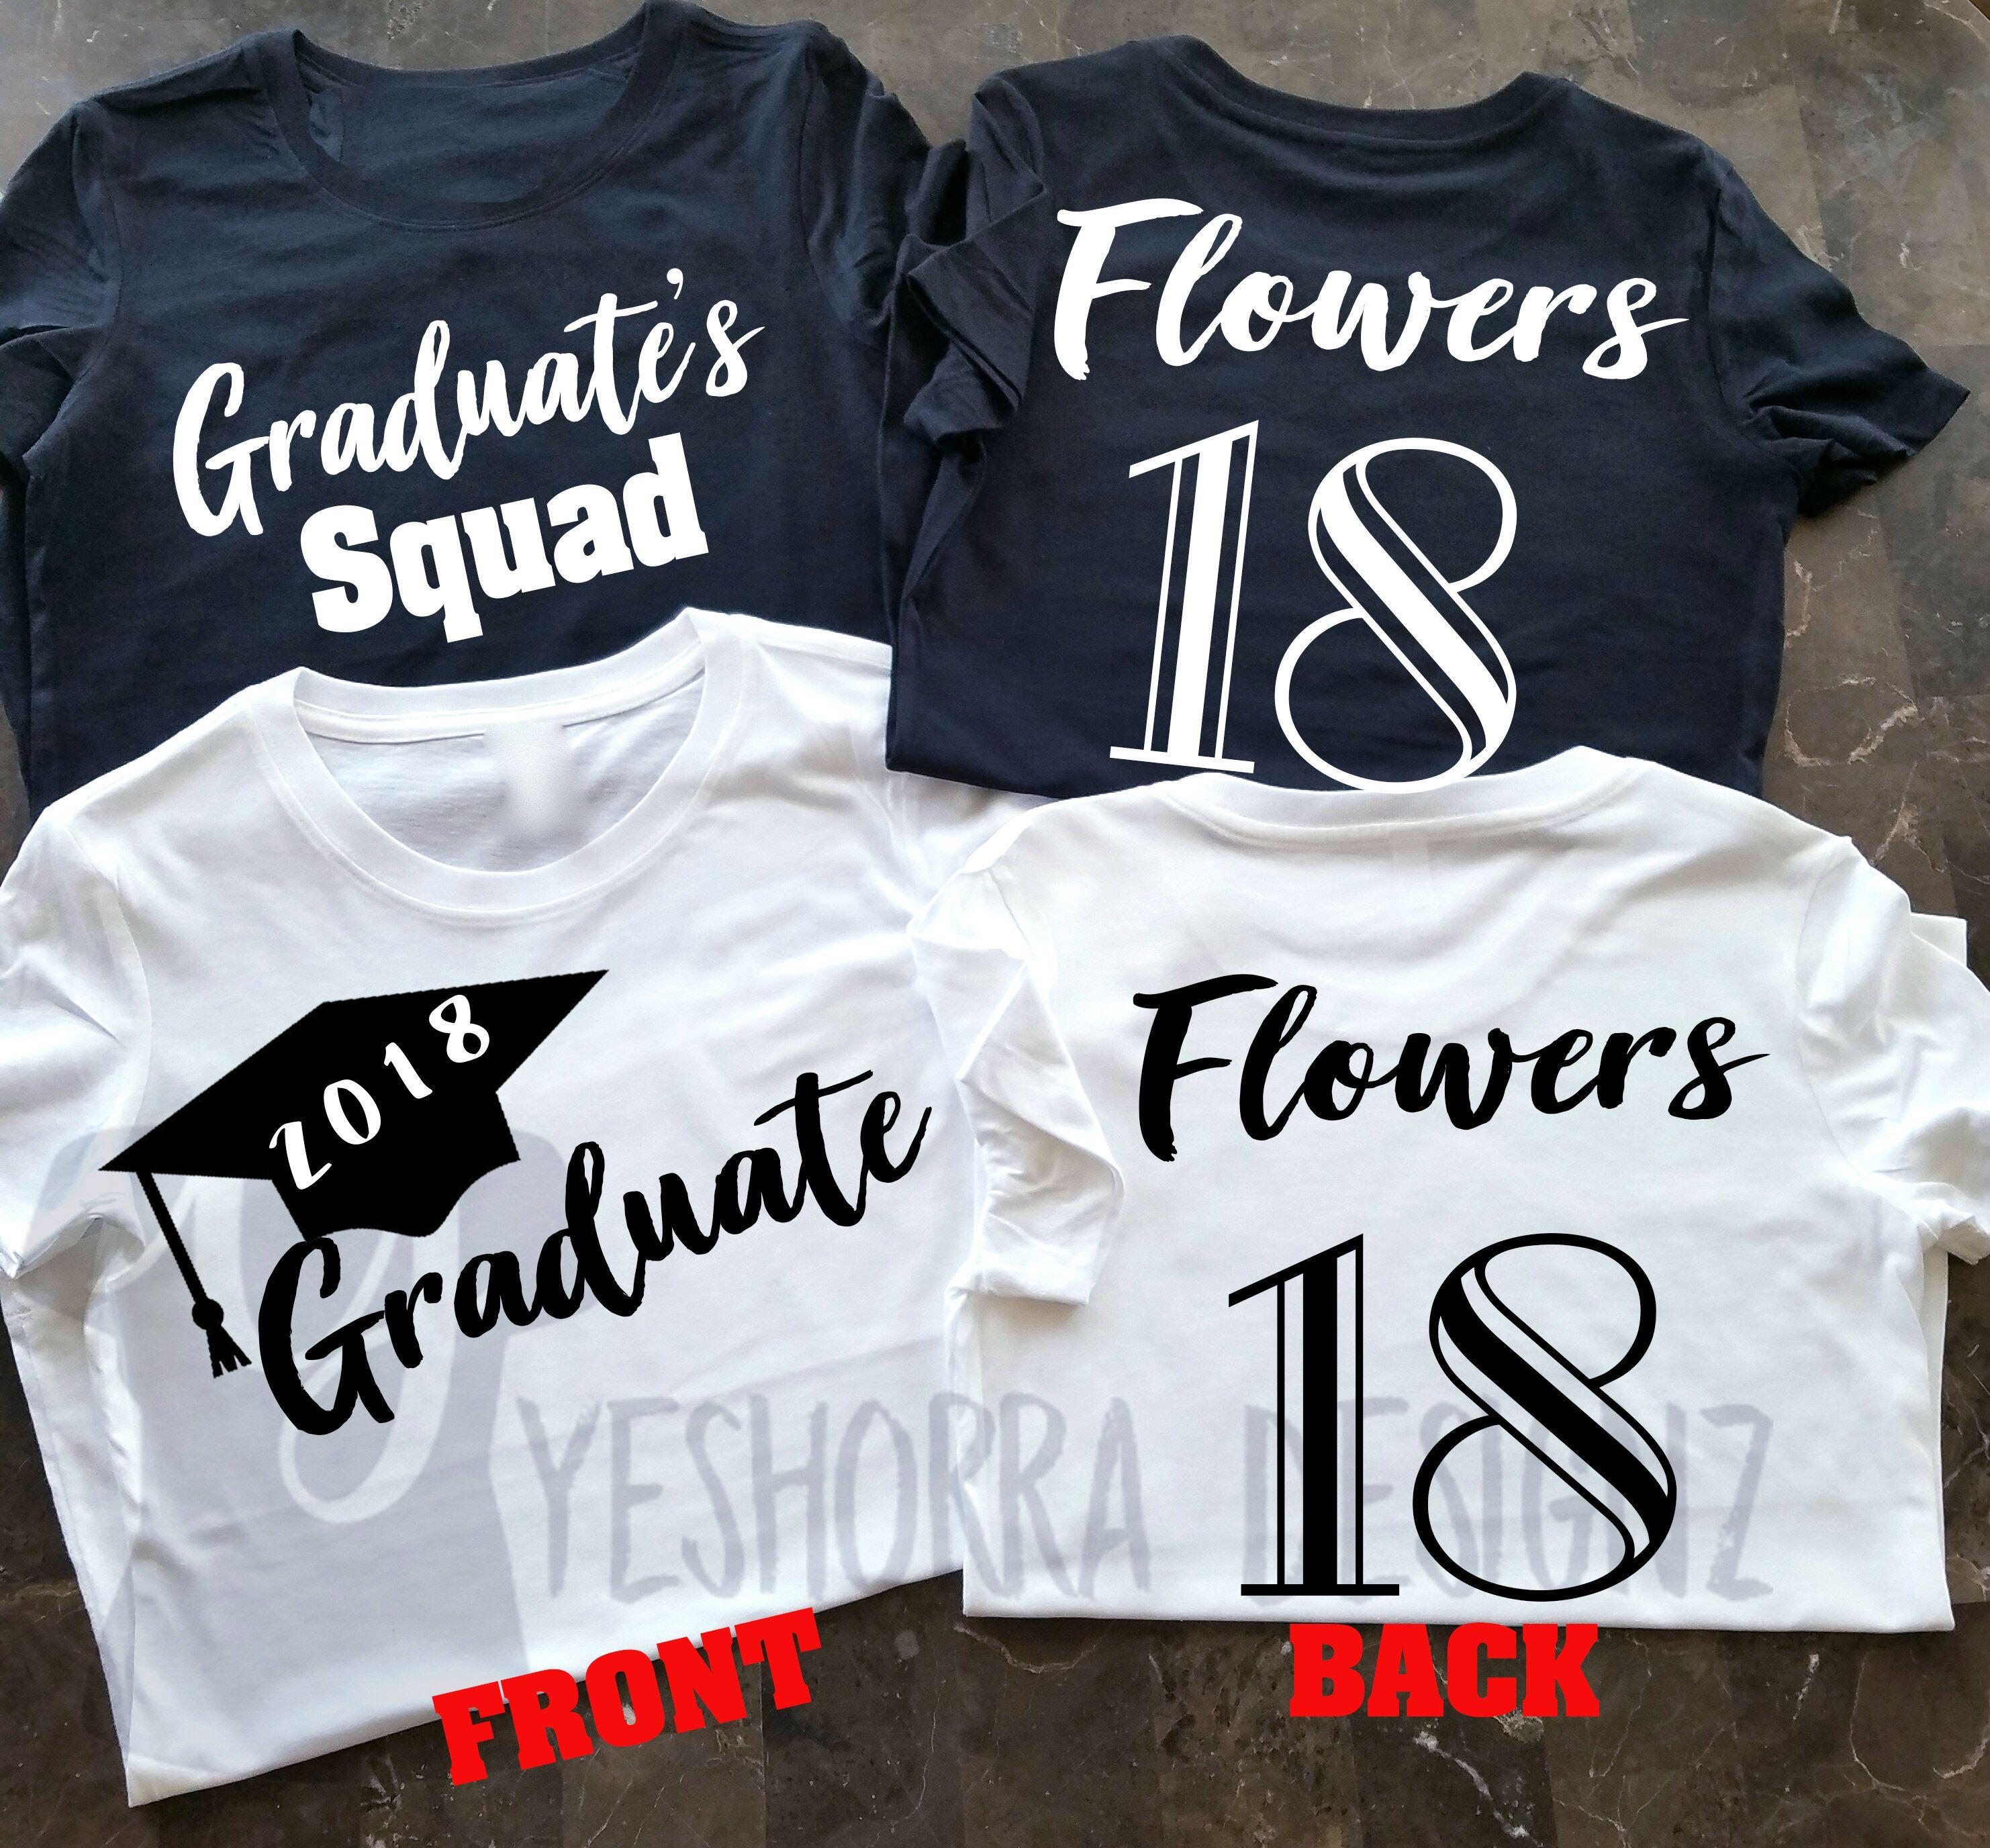 d290ef3f8 Graduate Shirt, Graduate Group Shirts, Graduate Squad Shirts, Customized Graduate  Shirt, Graduate